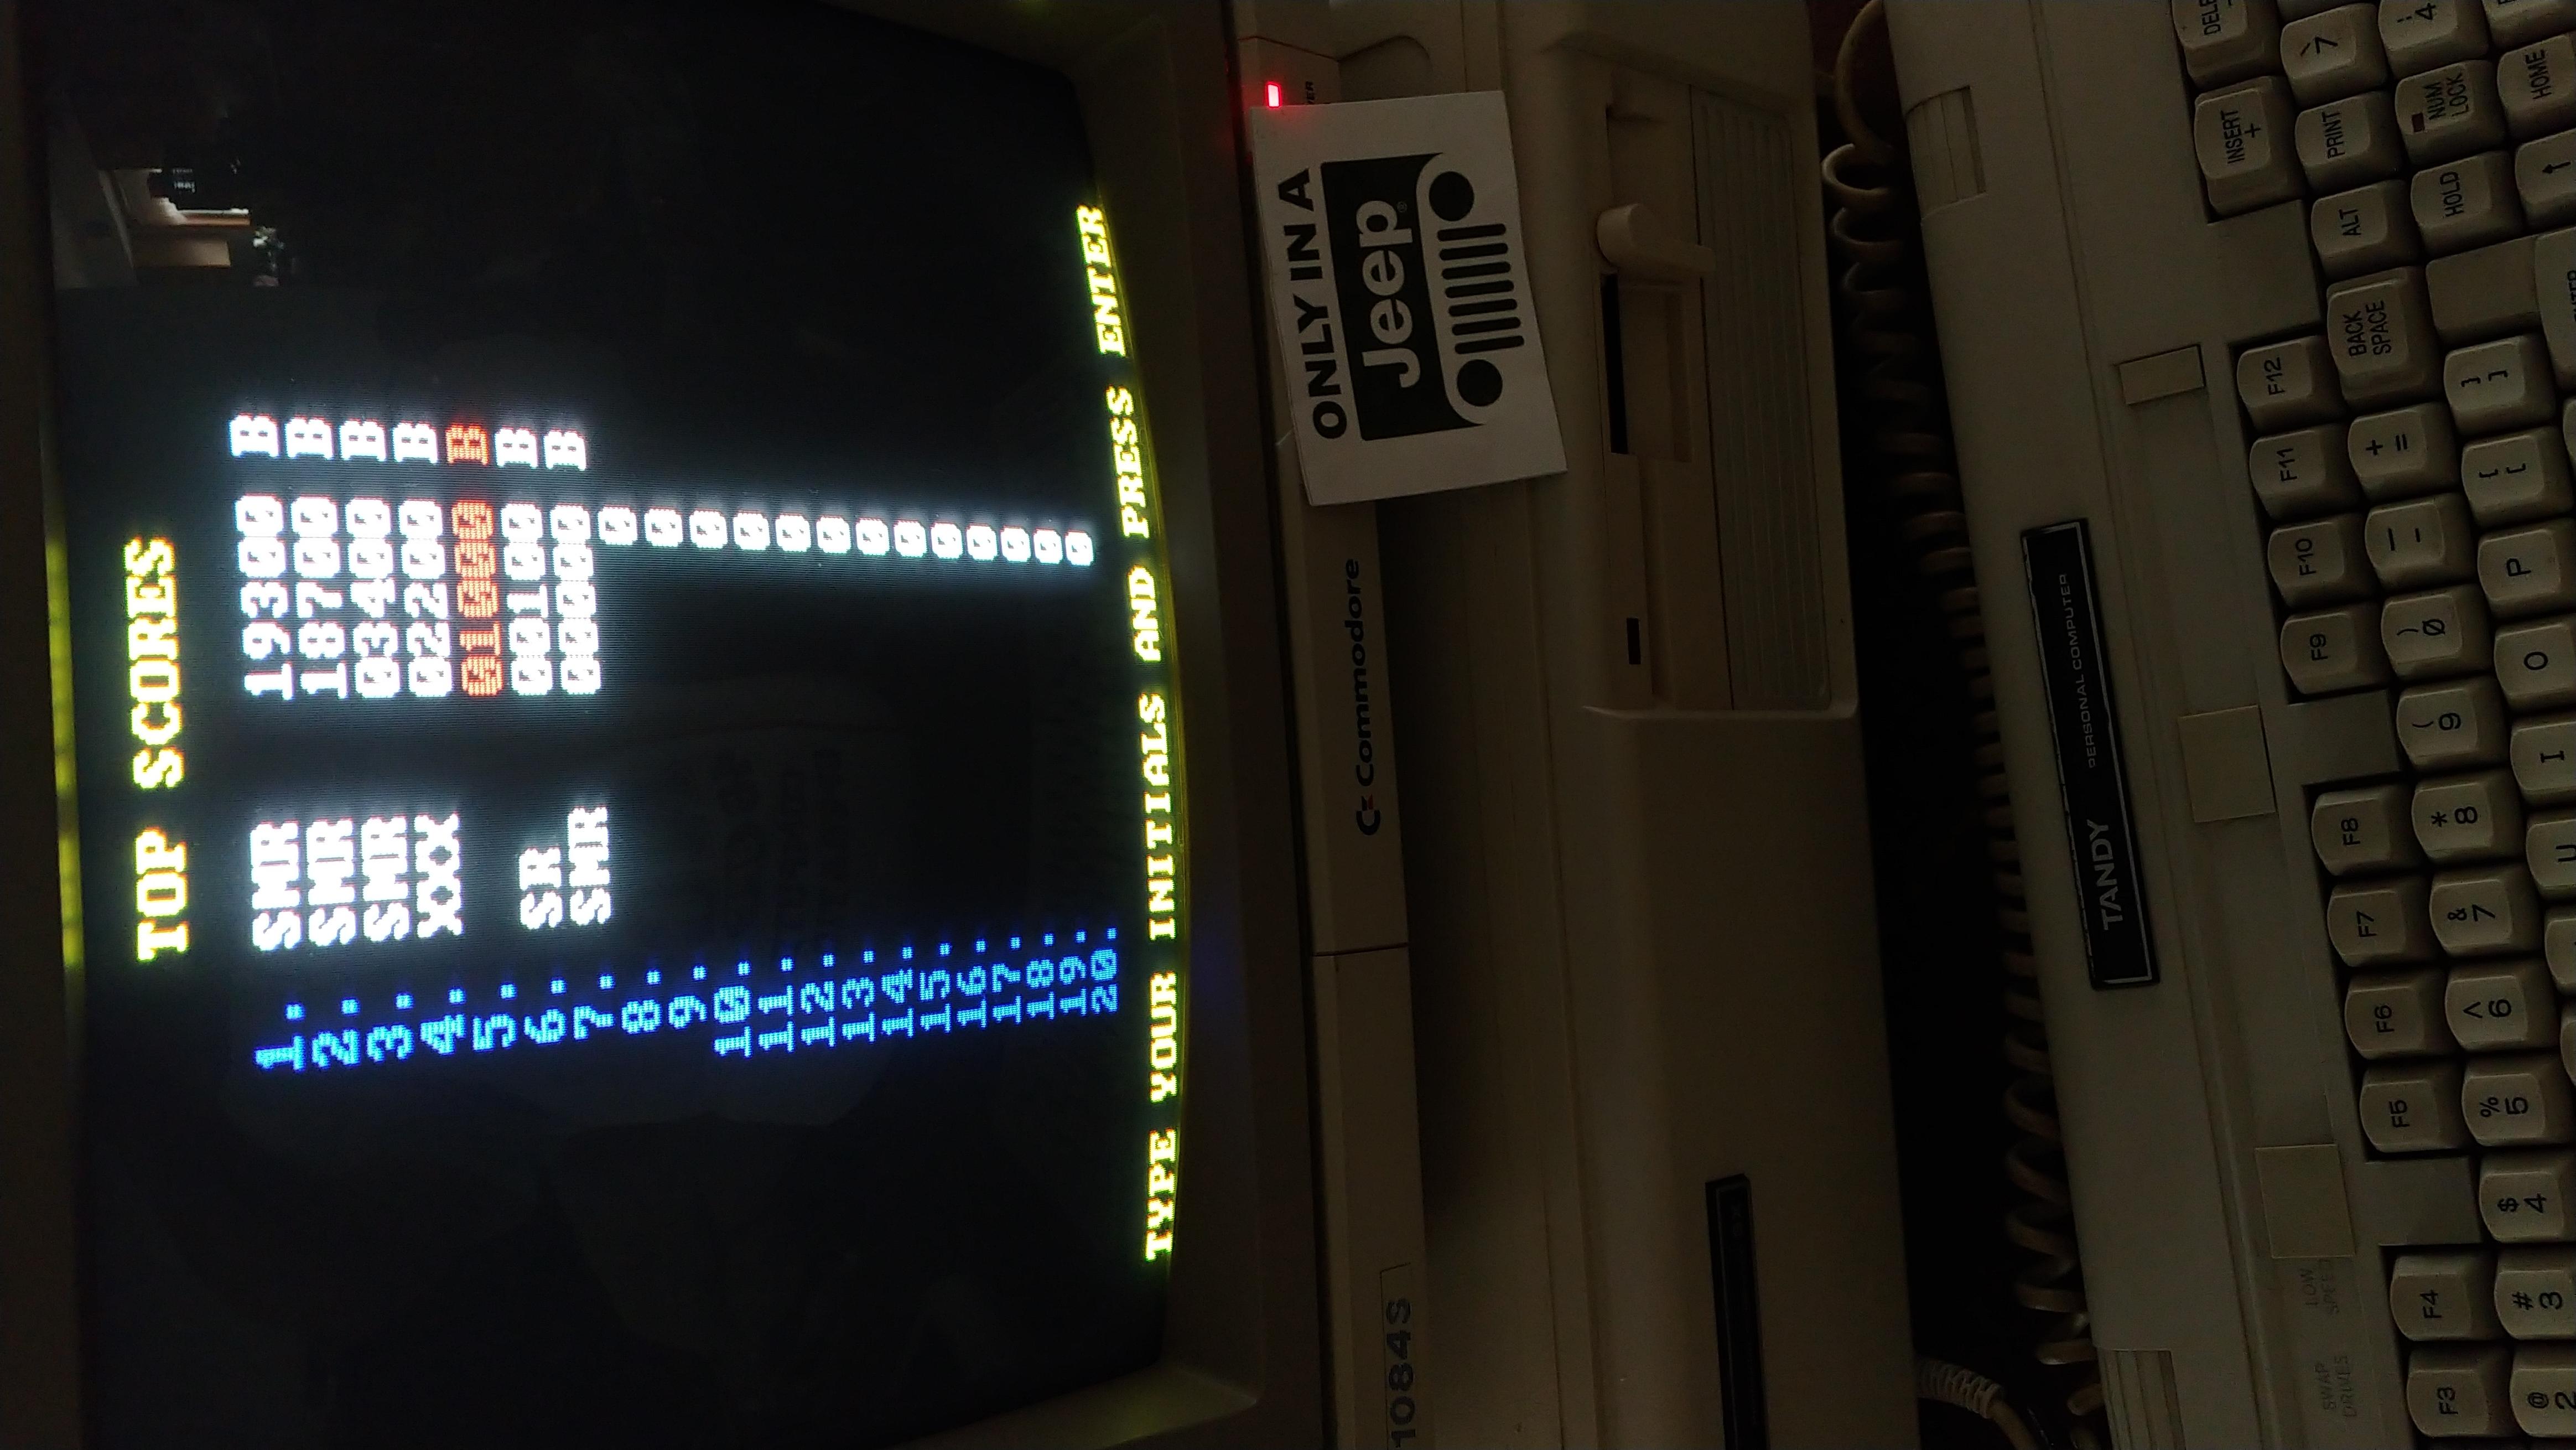 Jumpman: Beginner 19,300 points